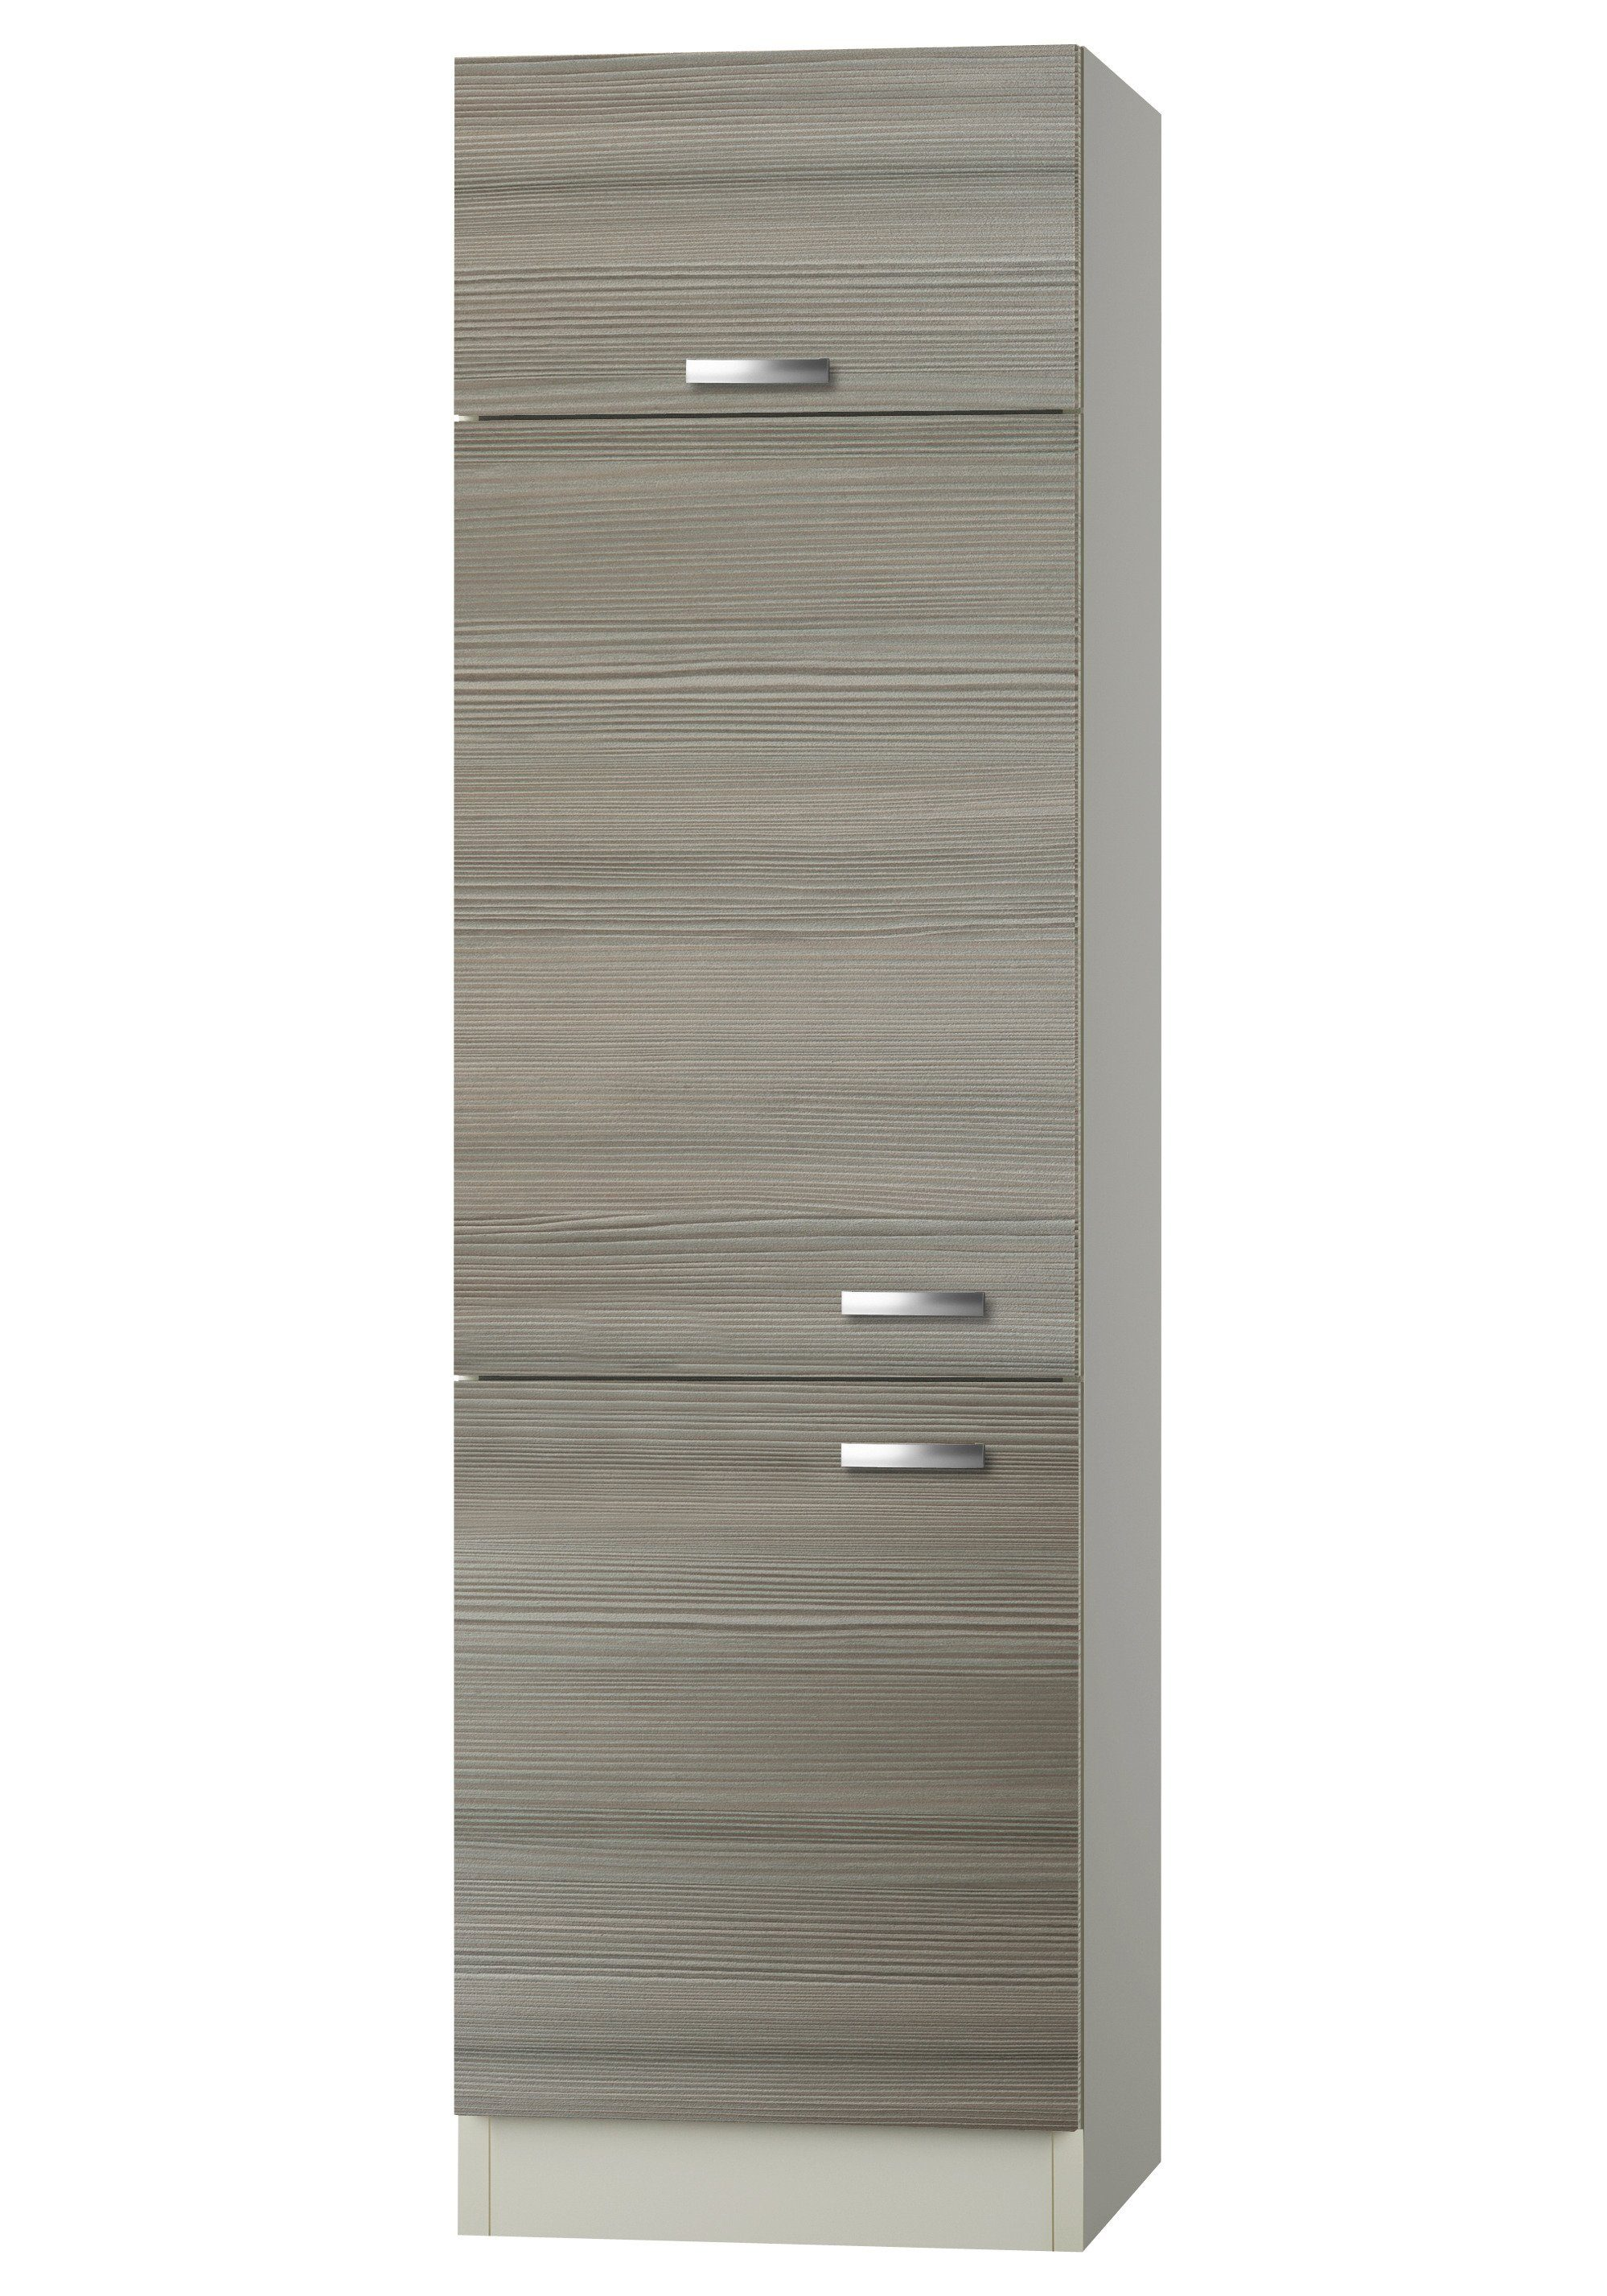 Kühlumbauschrank »Vigo«, Höhe 206,8 cm